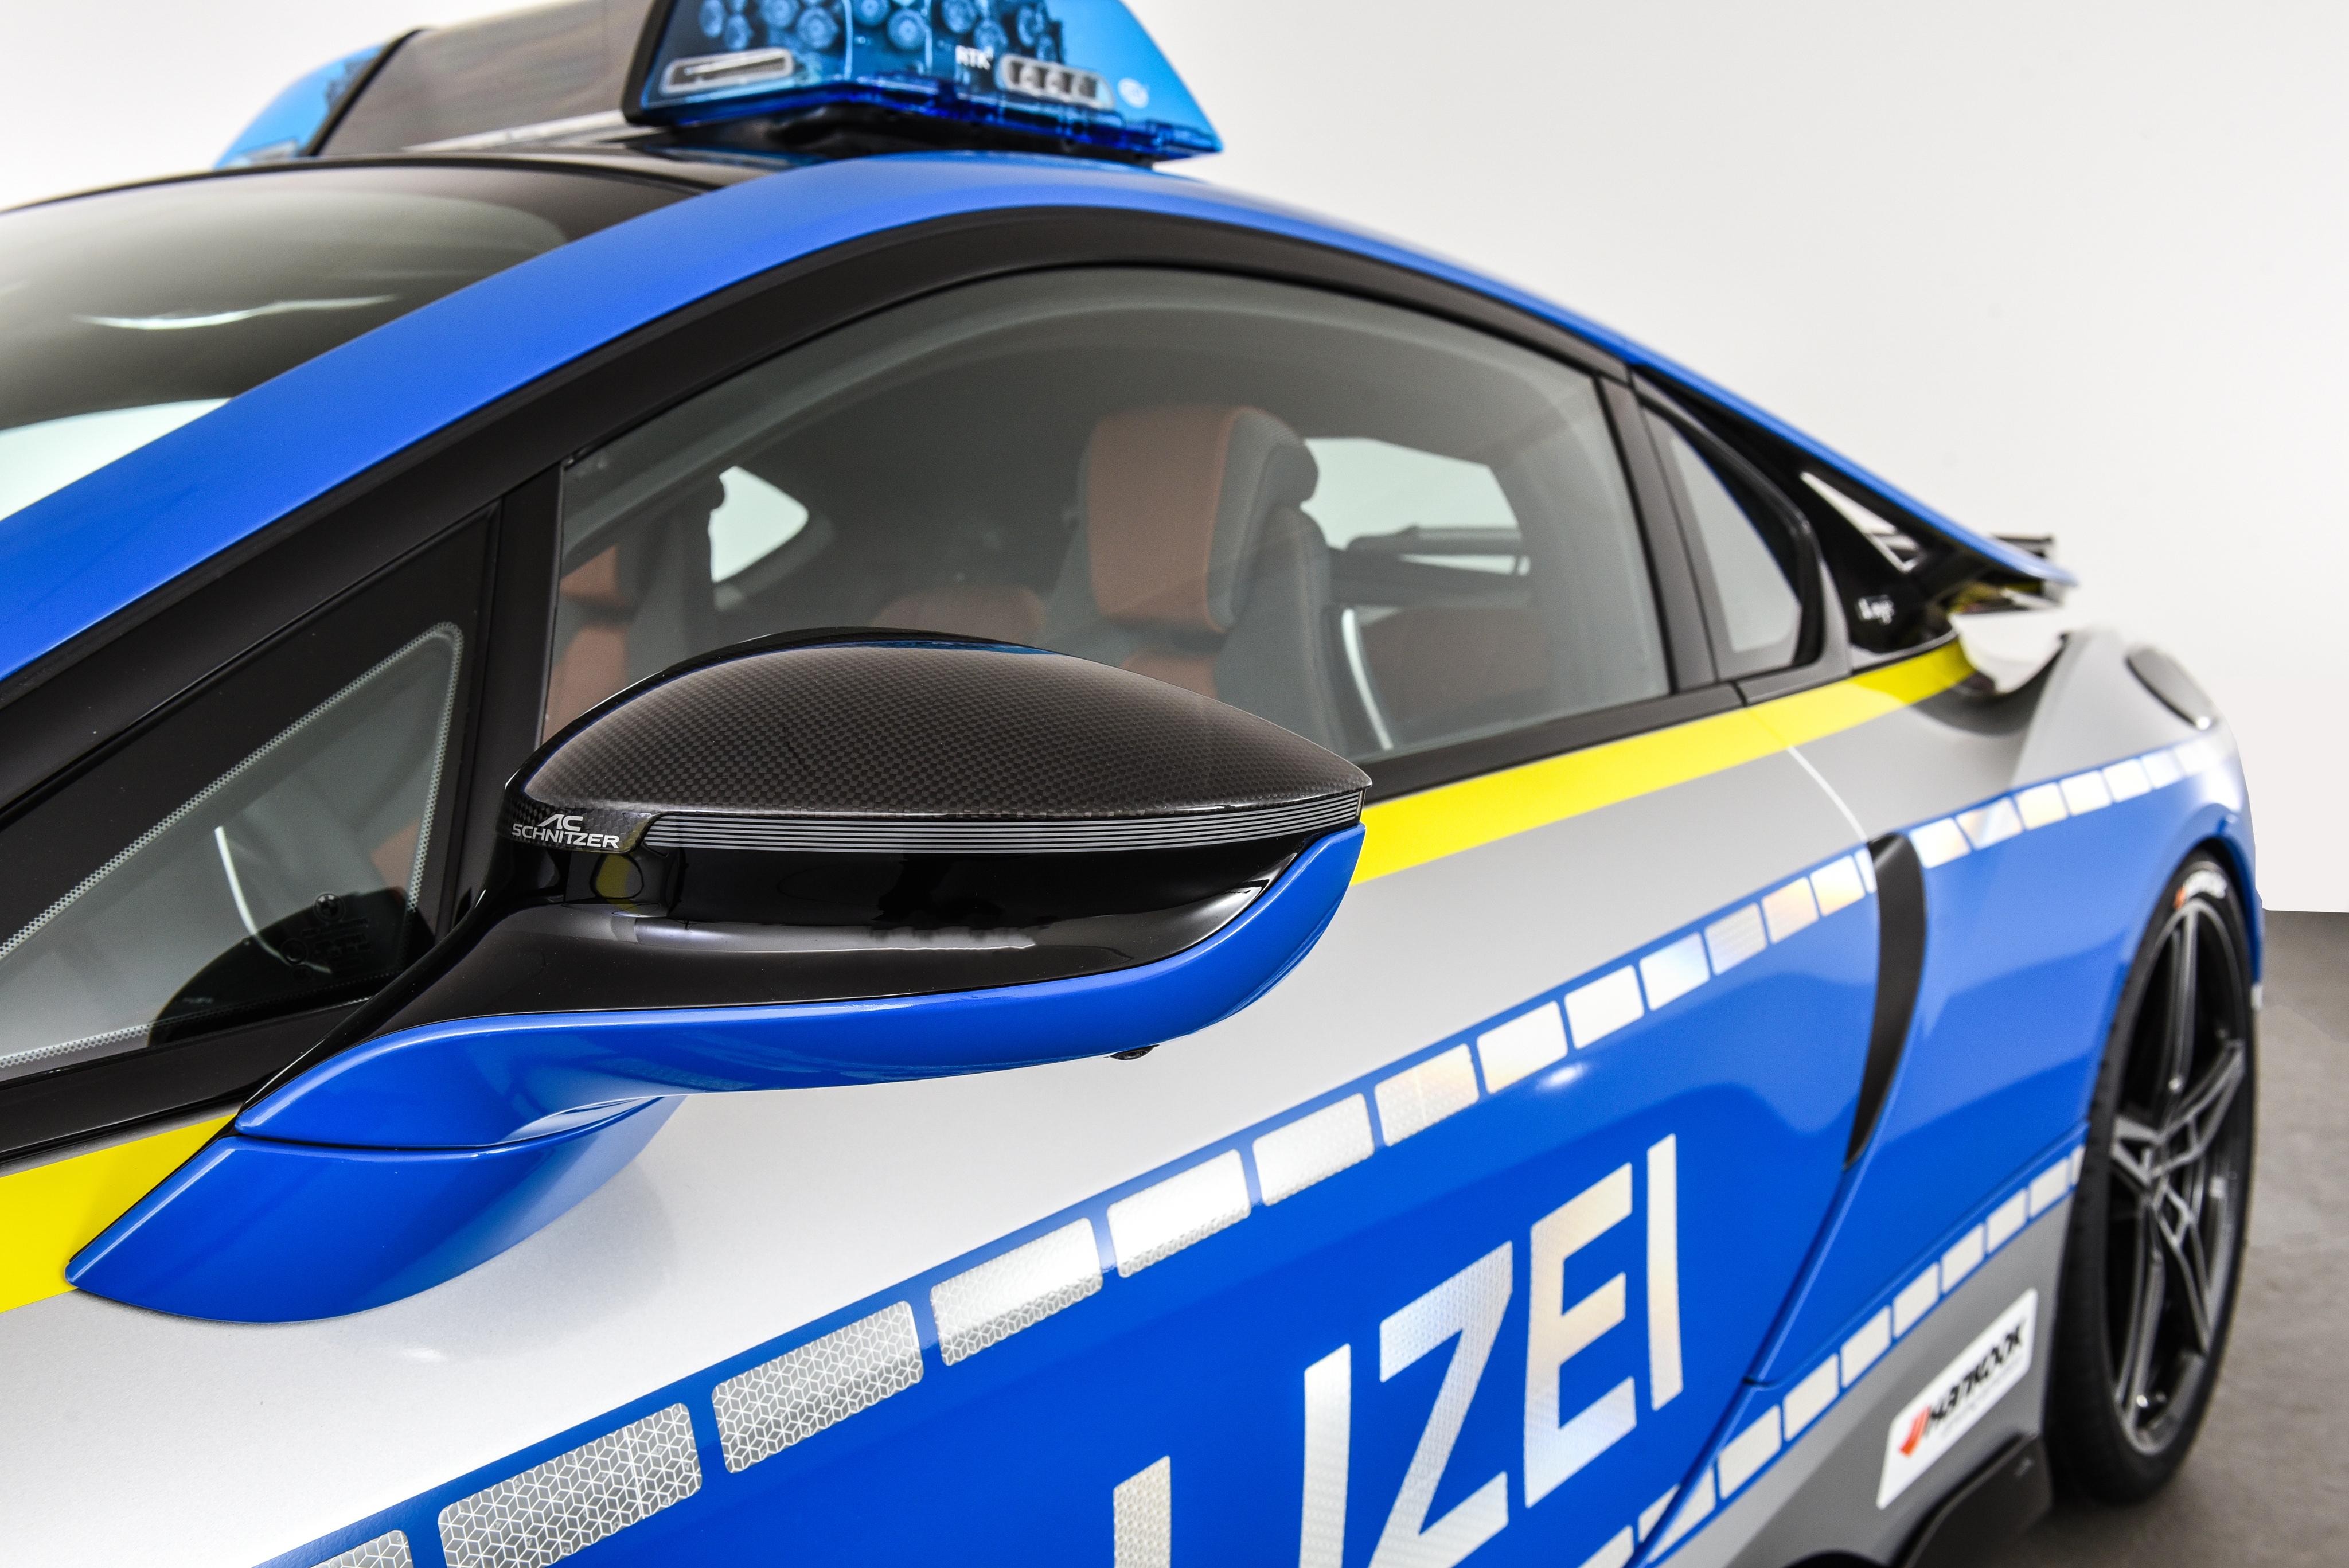 Meet The New Bmw I8 Cop Car Concept By Ac Schnitzer Paul Tan Image